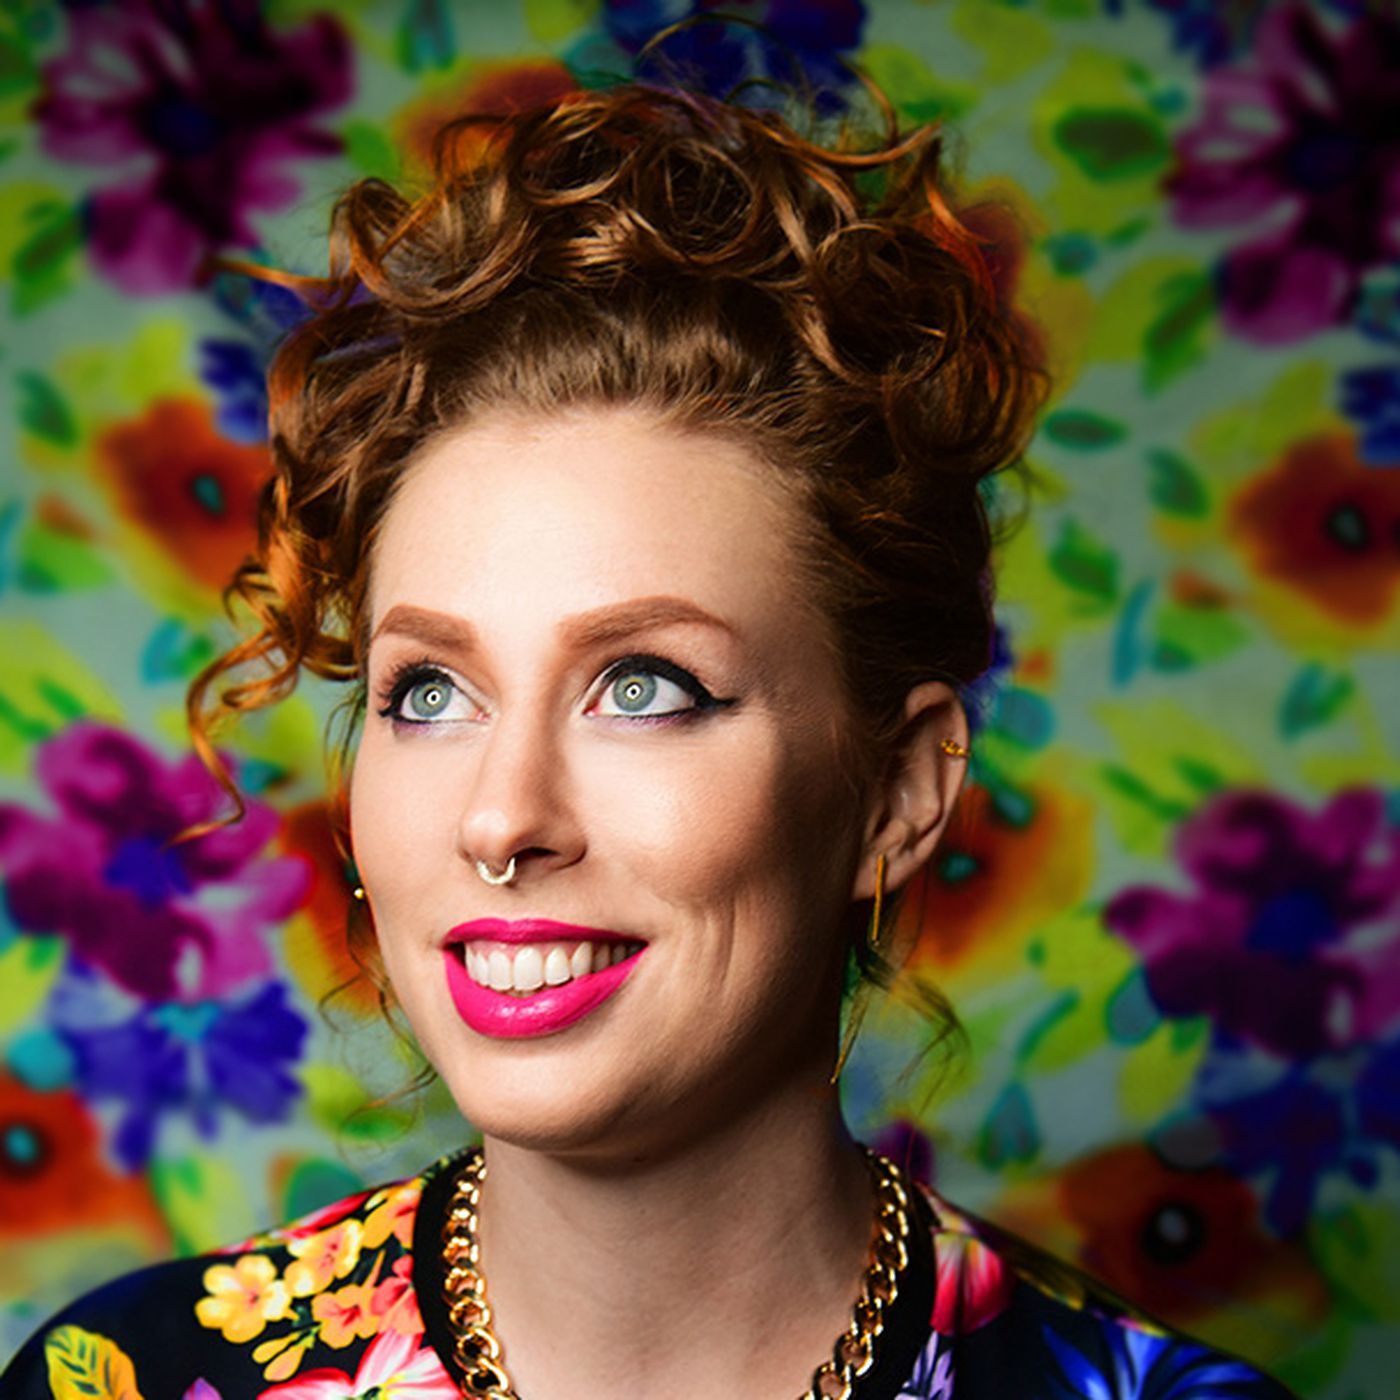 Vine Has a New Boss: Music Executive Hannah Donovan - Vox